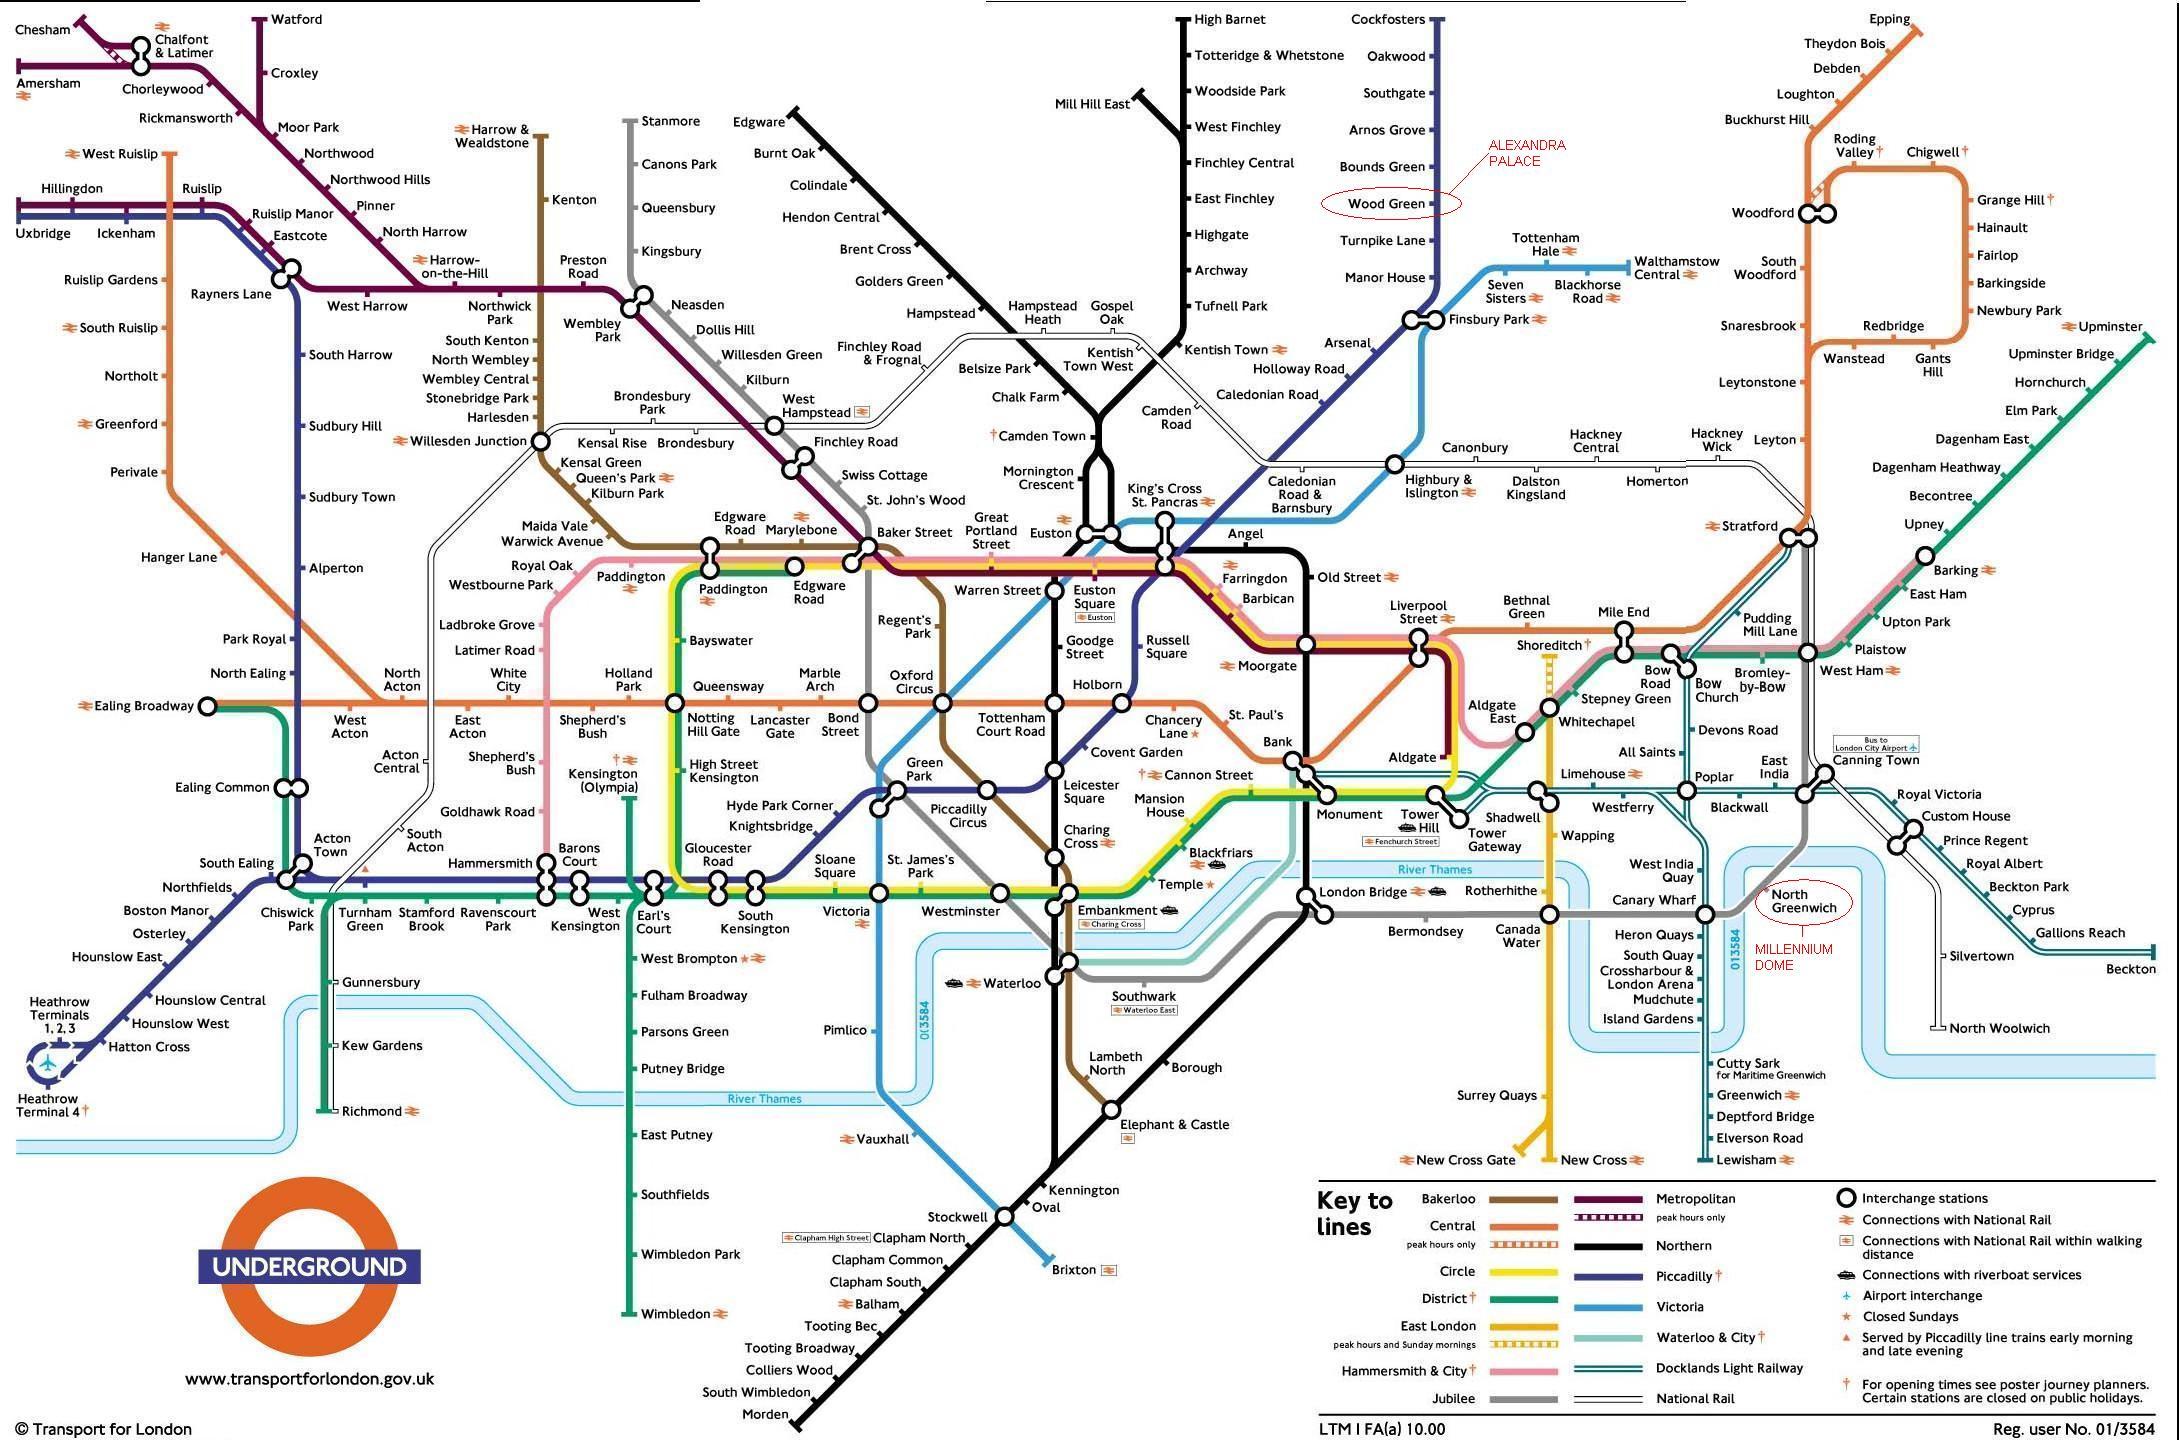 mapa rede metro londres Underground : Mapa do metrô de Londres , Inglaterra mapa rede metro londres